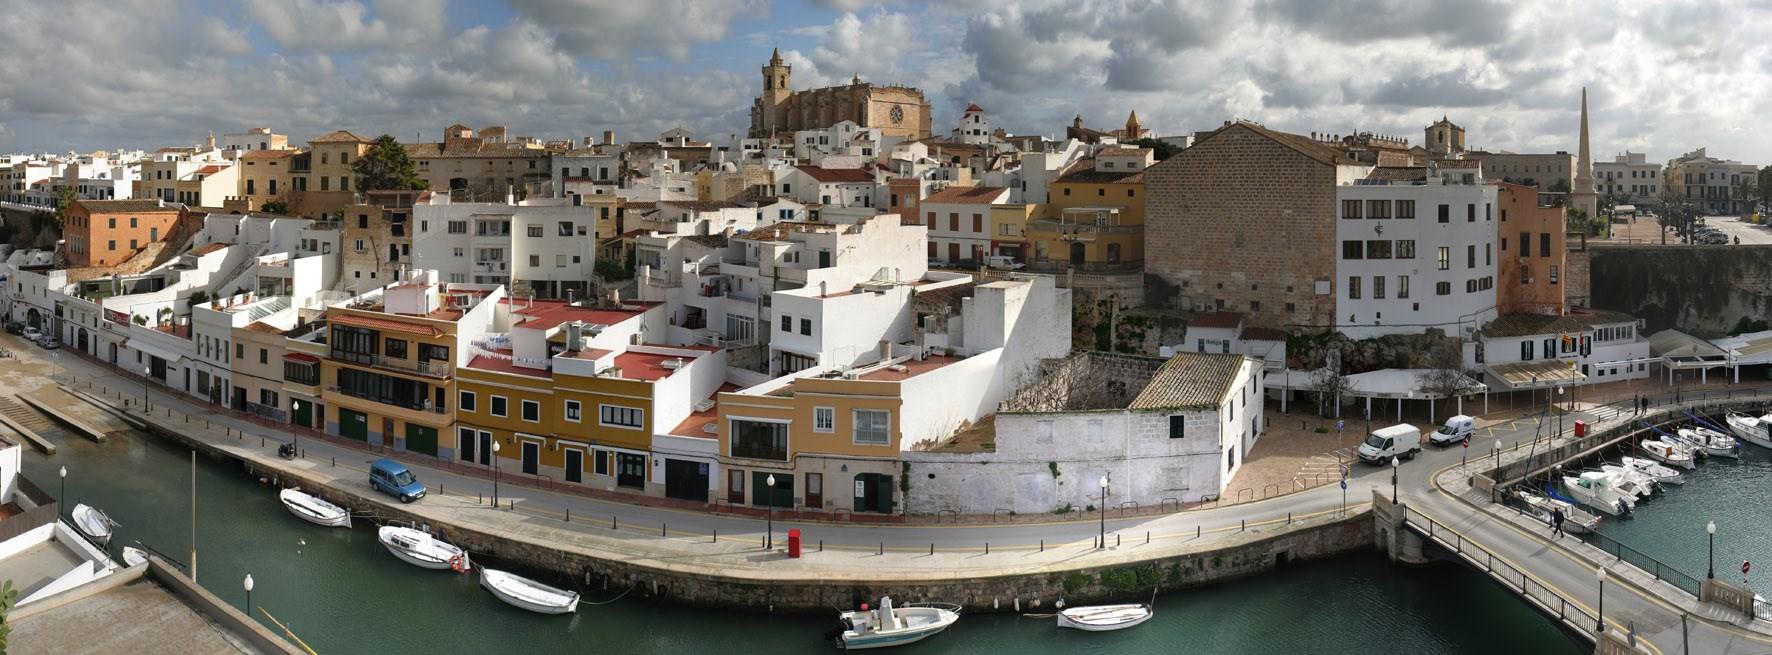 "Annonce immobilière à Ciutadella de Menorca ""  Ciutadella de Menorca"""